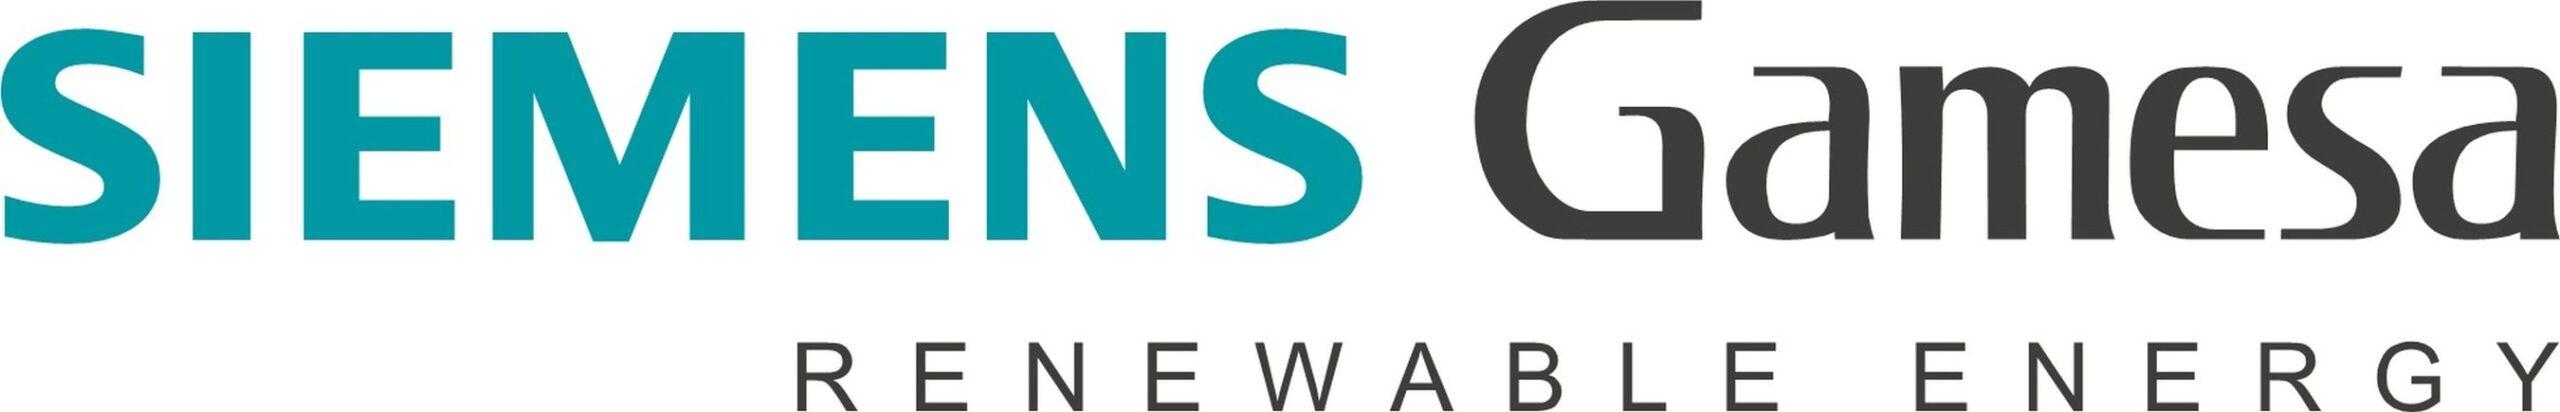 Siemens Gamesa will supply 567 MW to ReNew Power for two wind projects (PRNewsfoto/Siemens Gamesa)